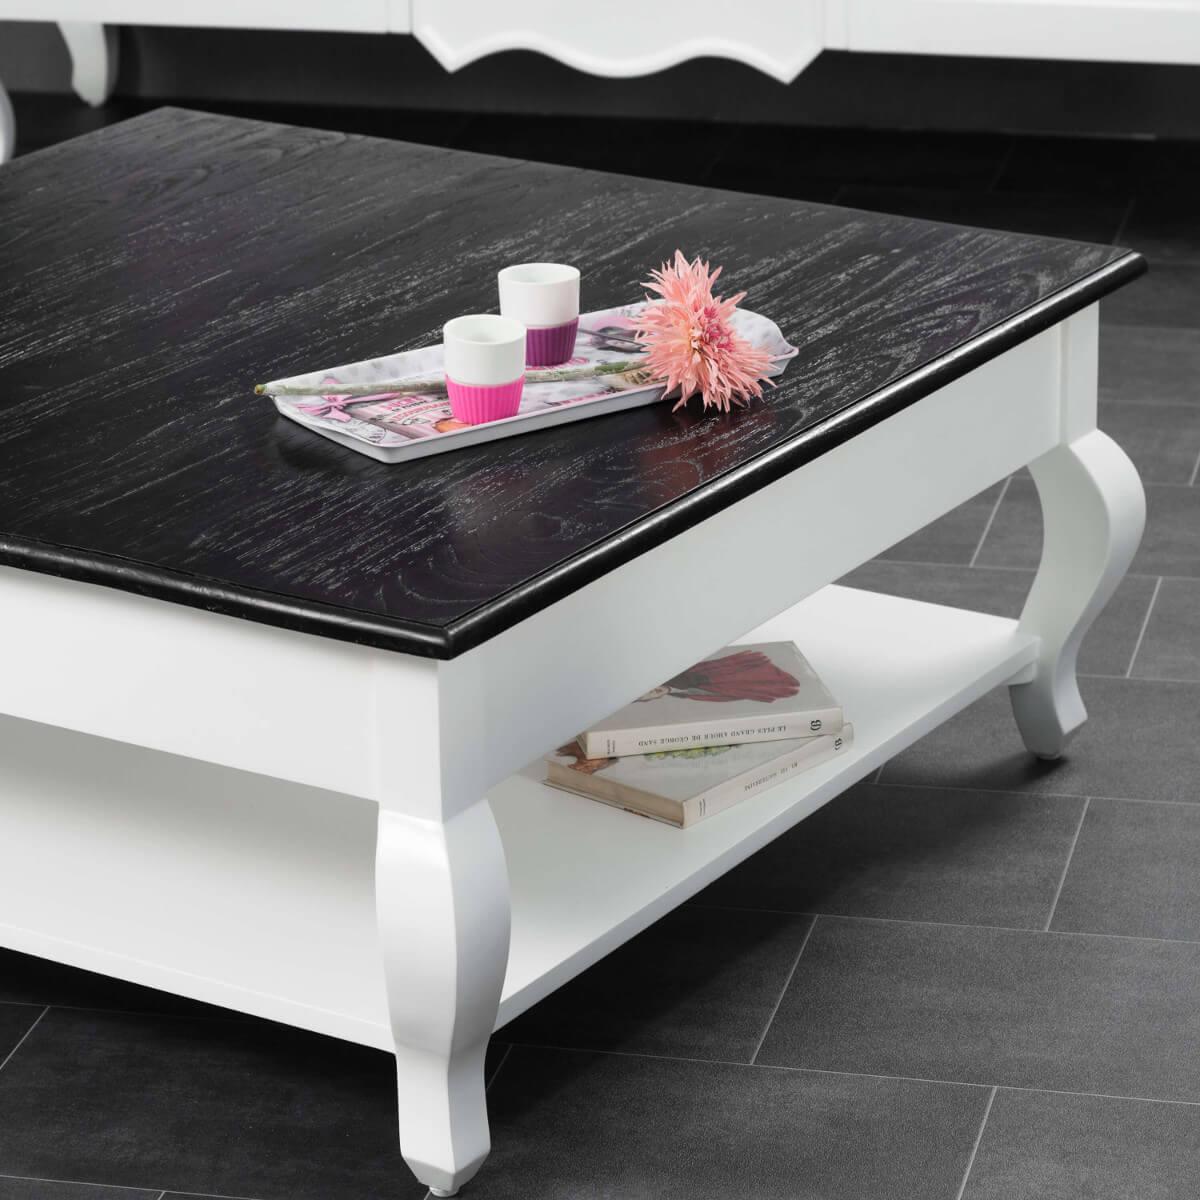 table basse acajou bois massif carr e blanche noire idao 95 cm. Black Bedroom Furniture Sets. Home Design Ideas